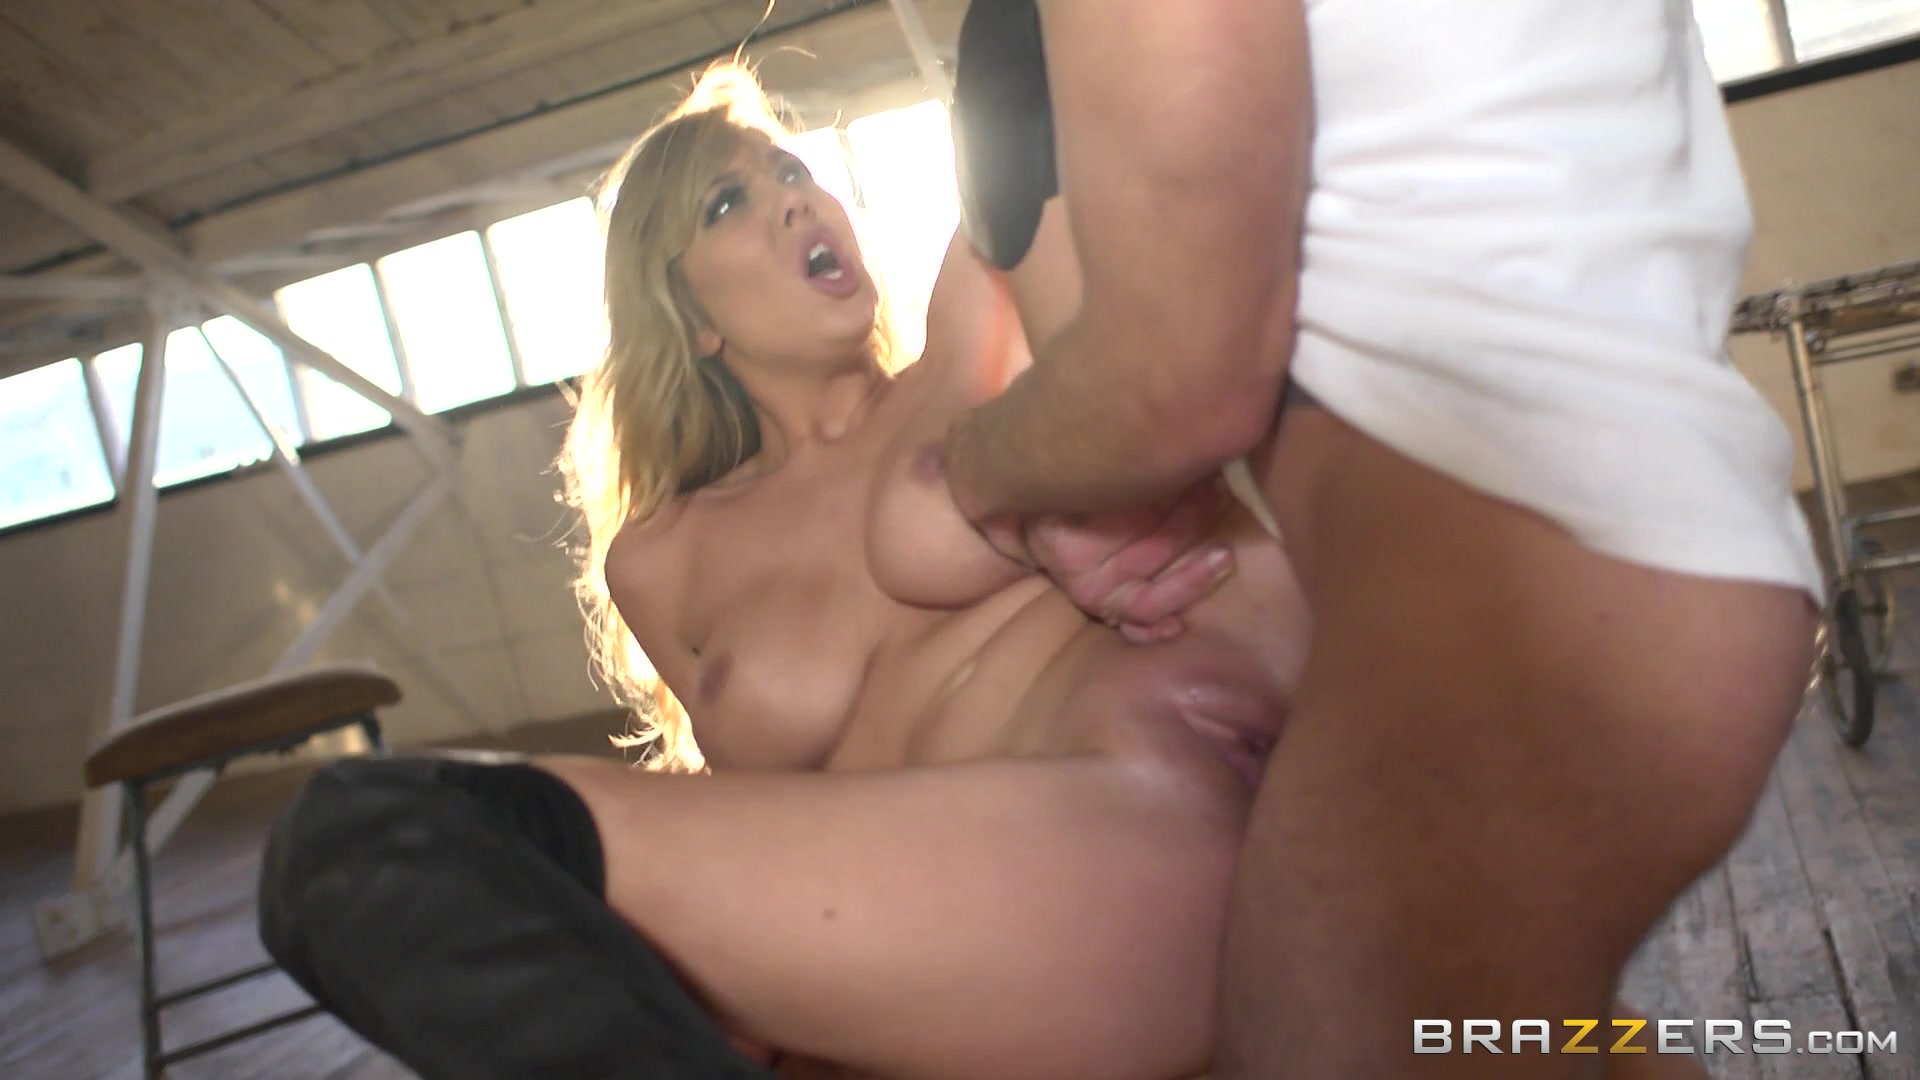 Porn using sex toys